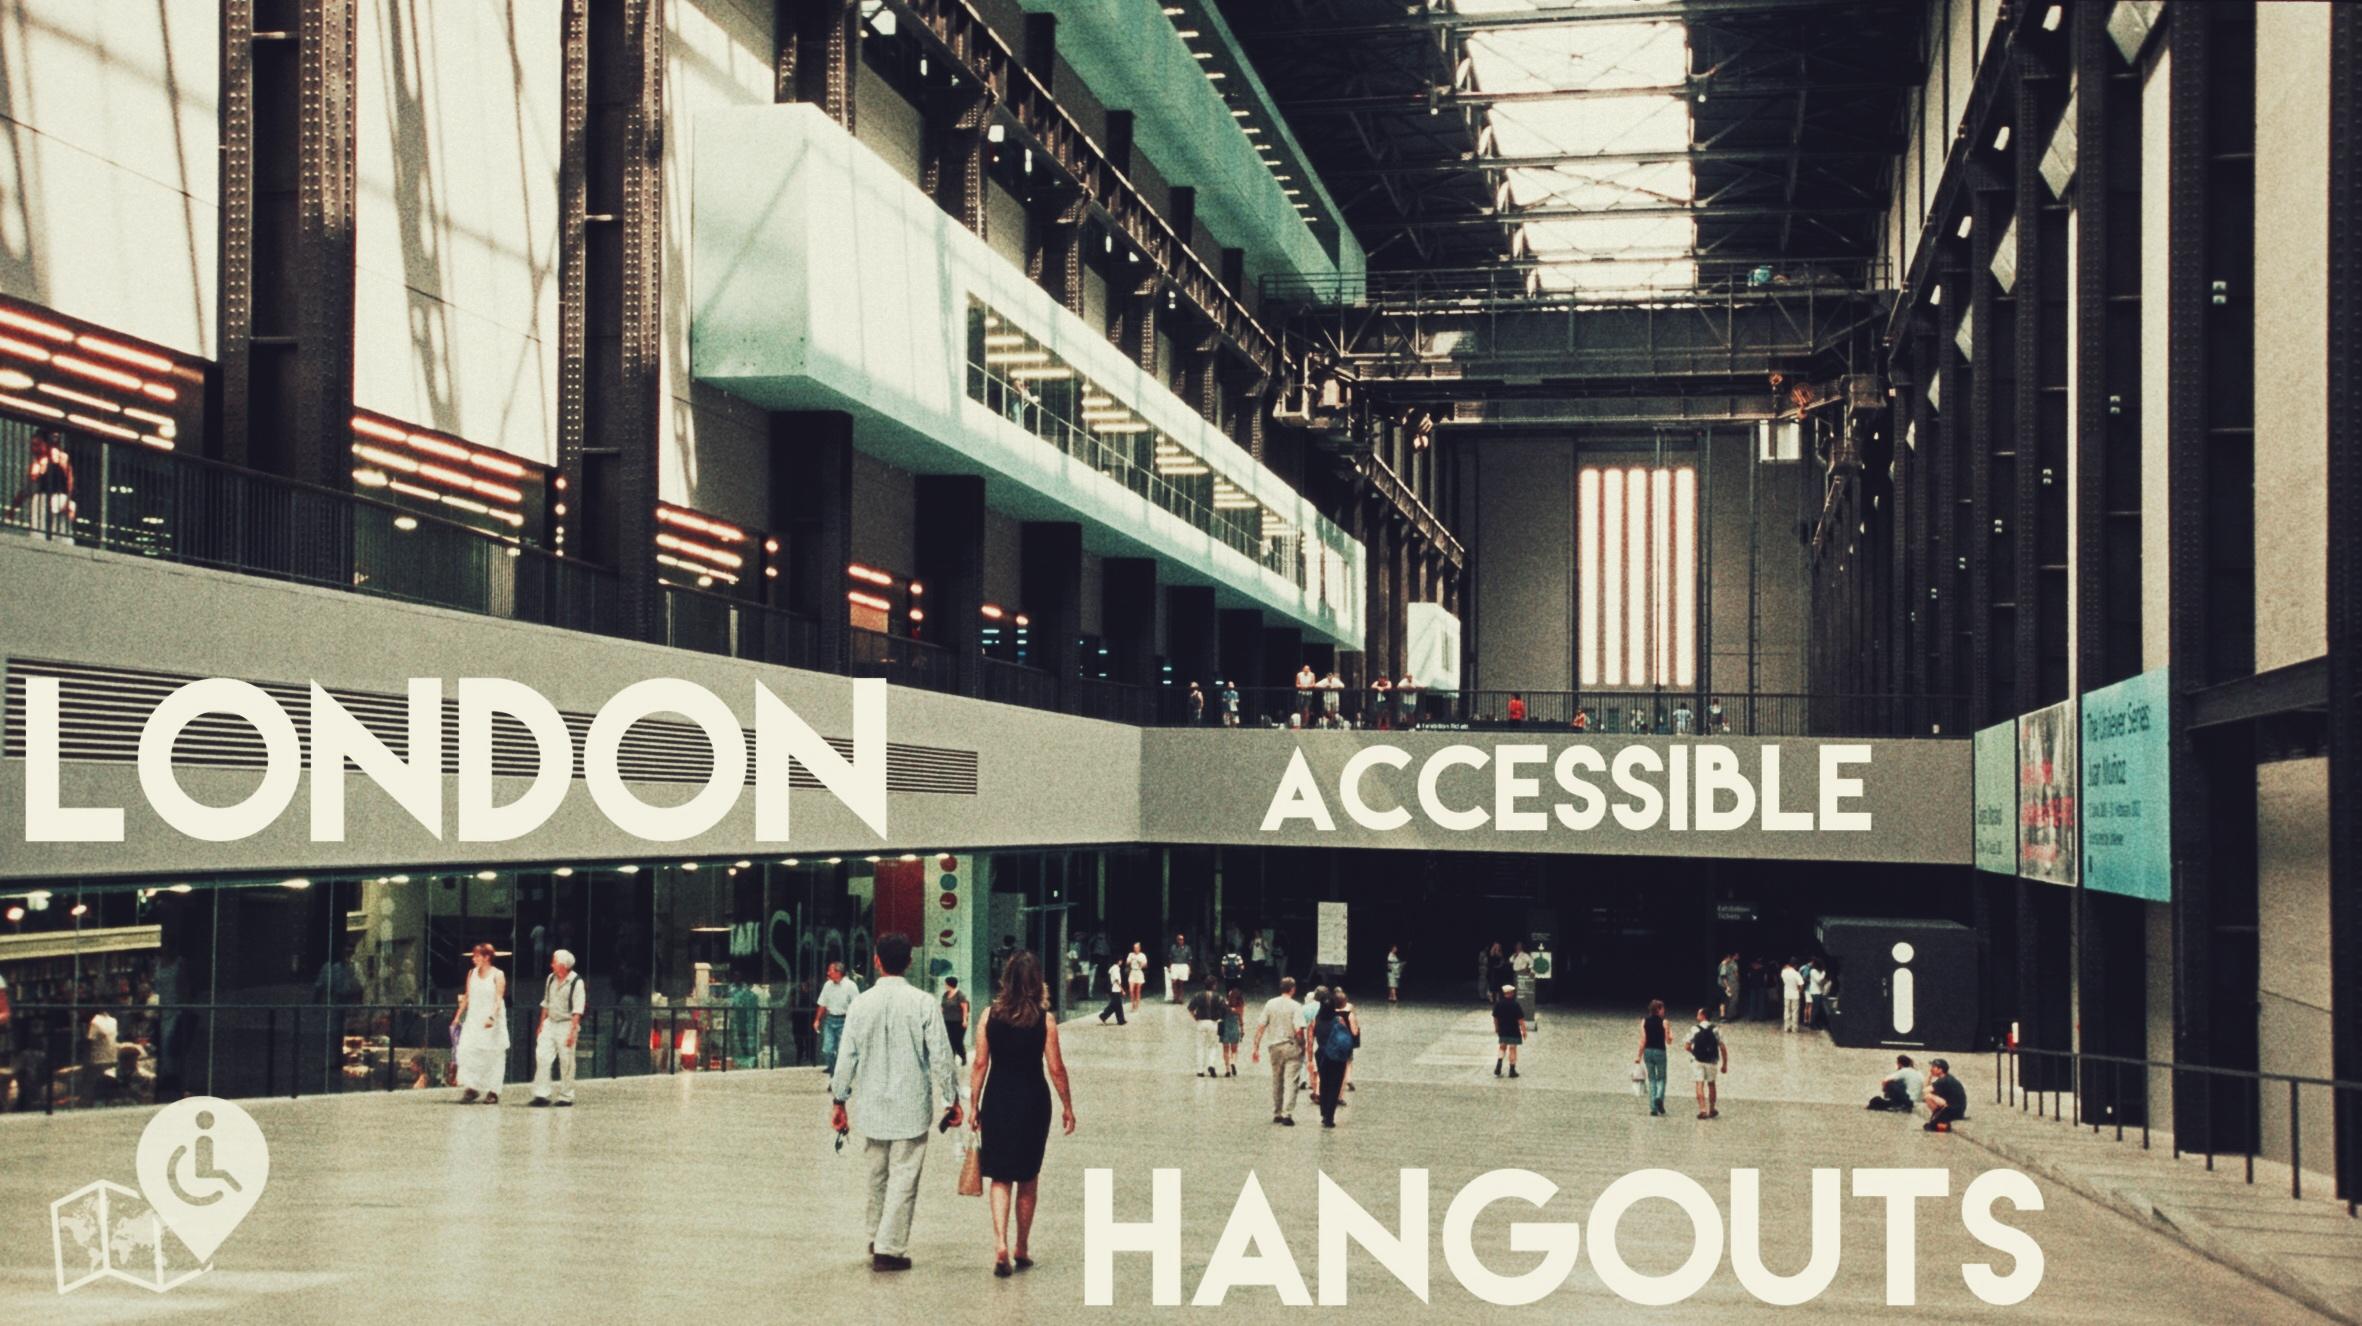 London Accessible Hangouts .jpg